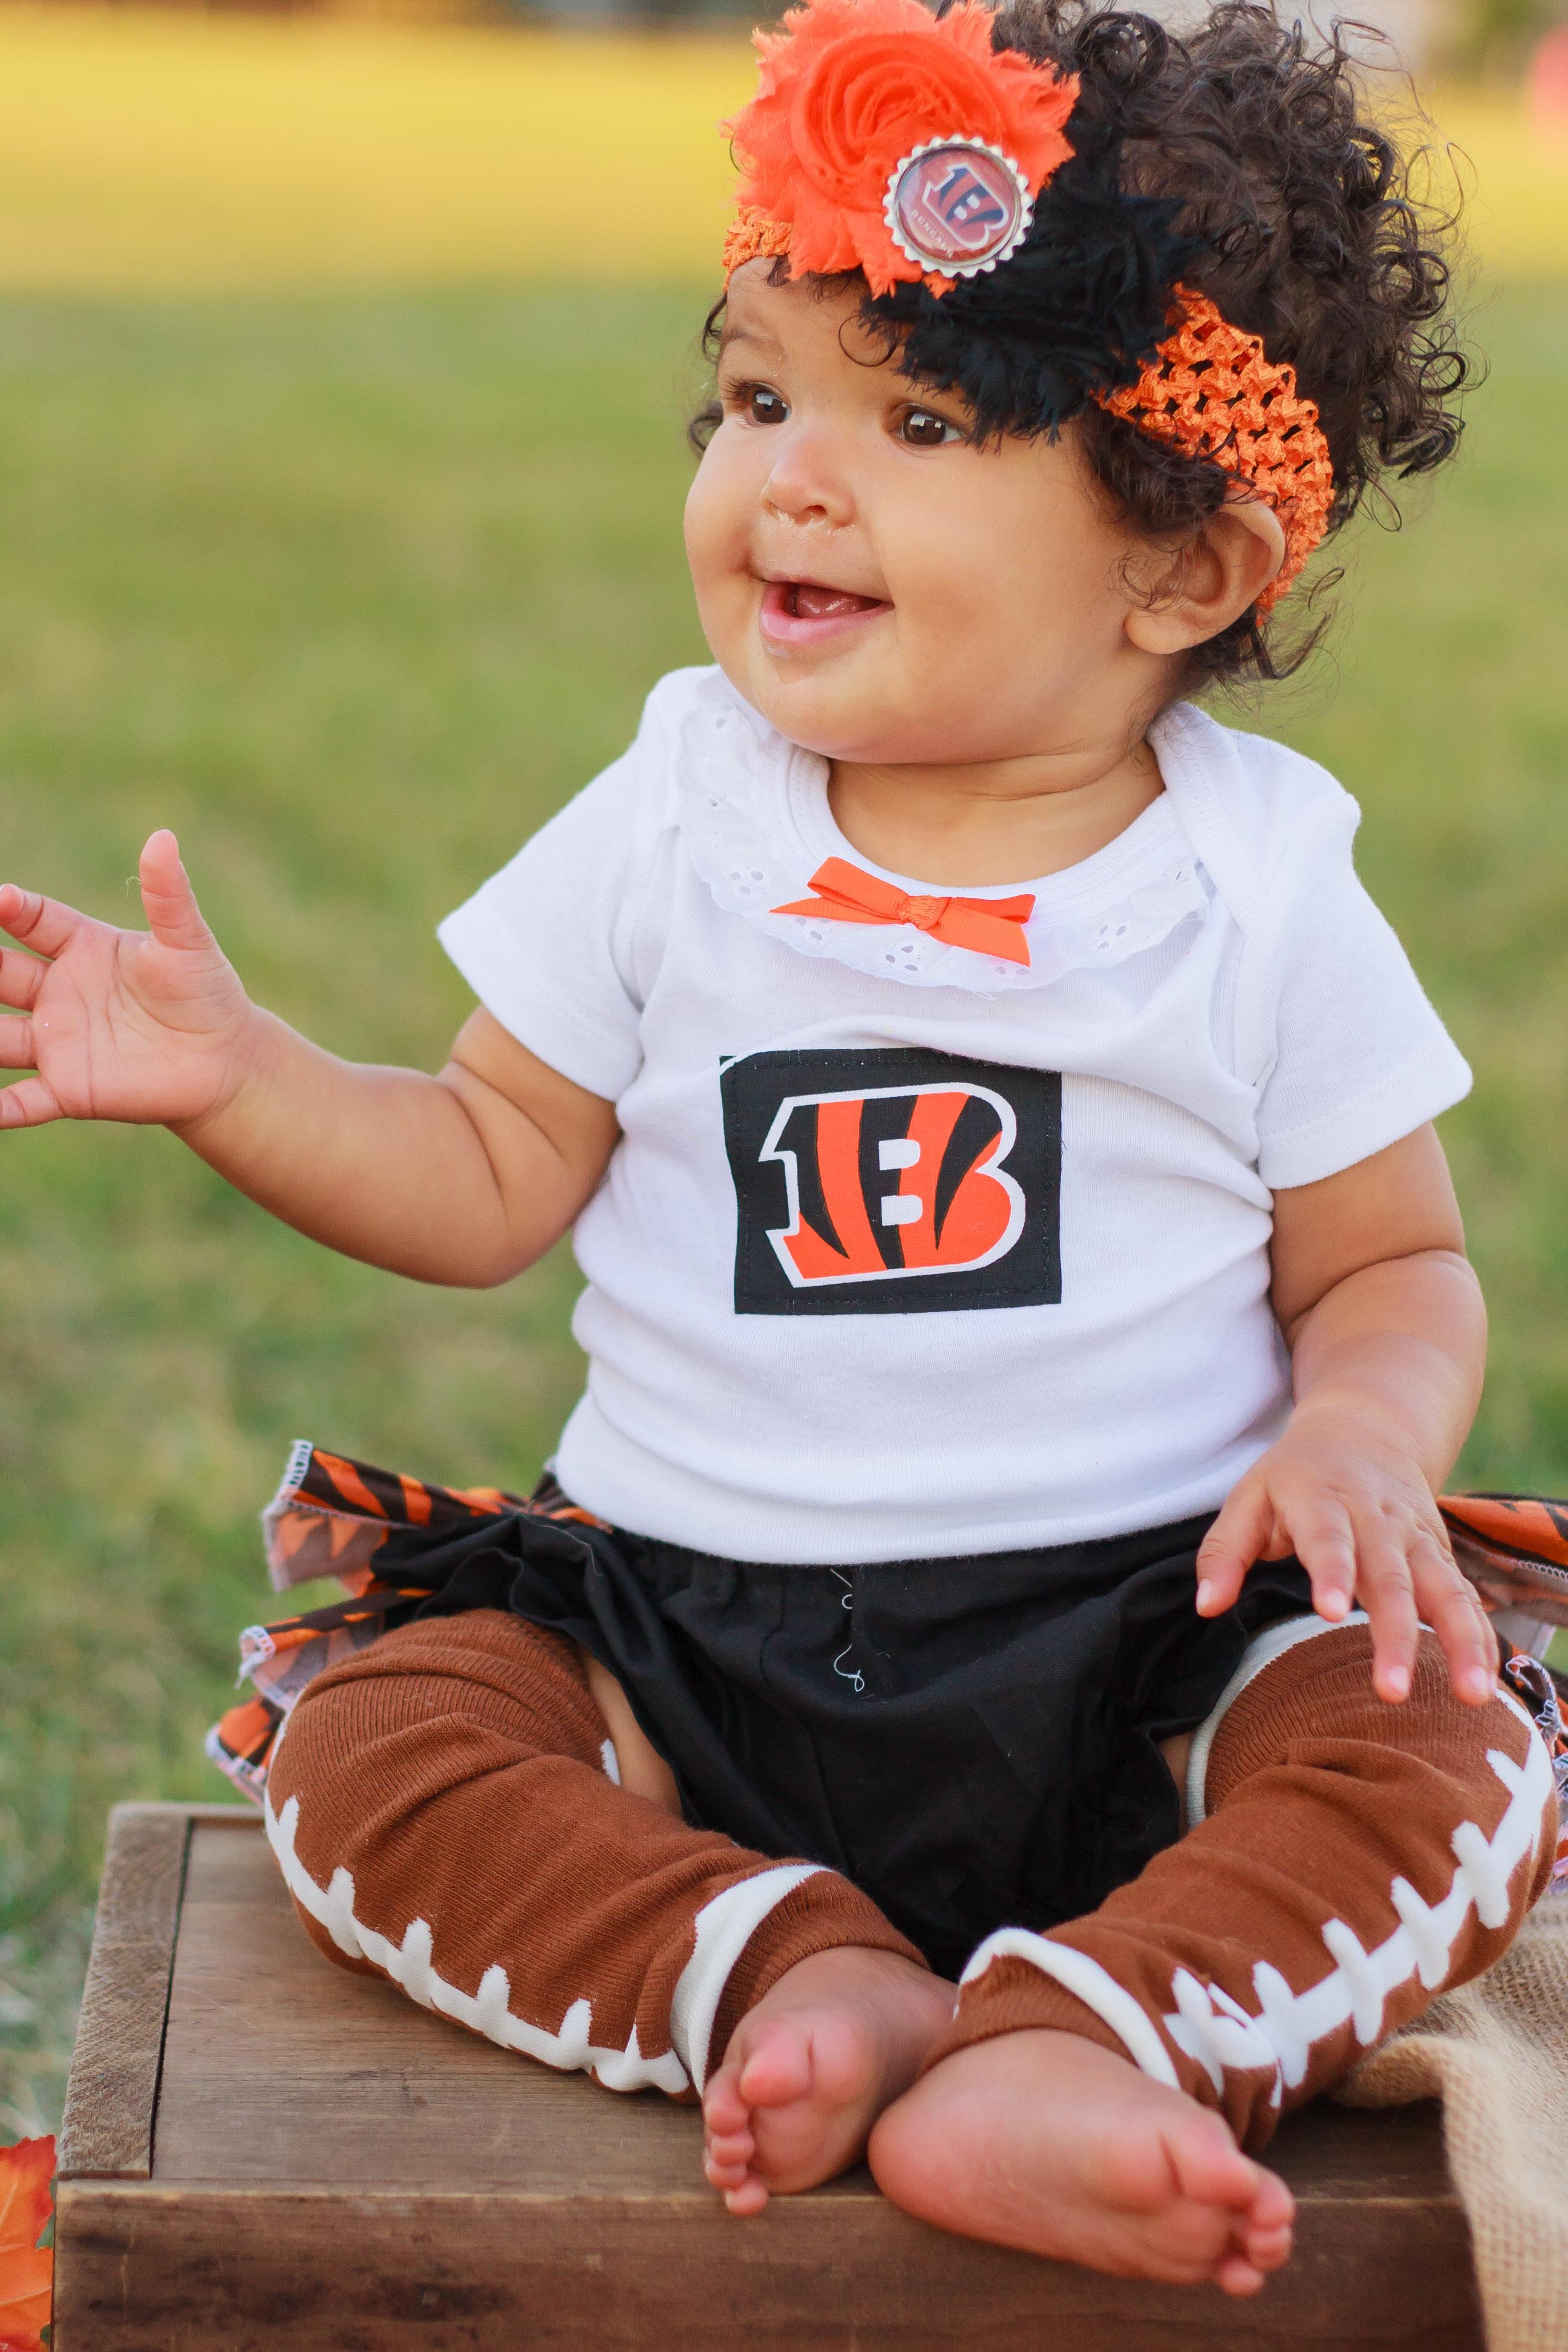 Football Legwarmers babies Toddlers Legwarmers Baby Accessories